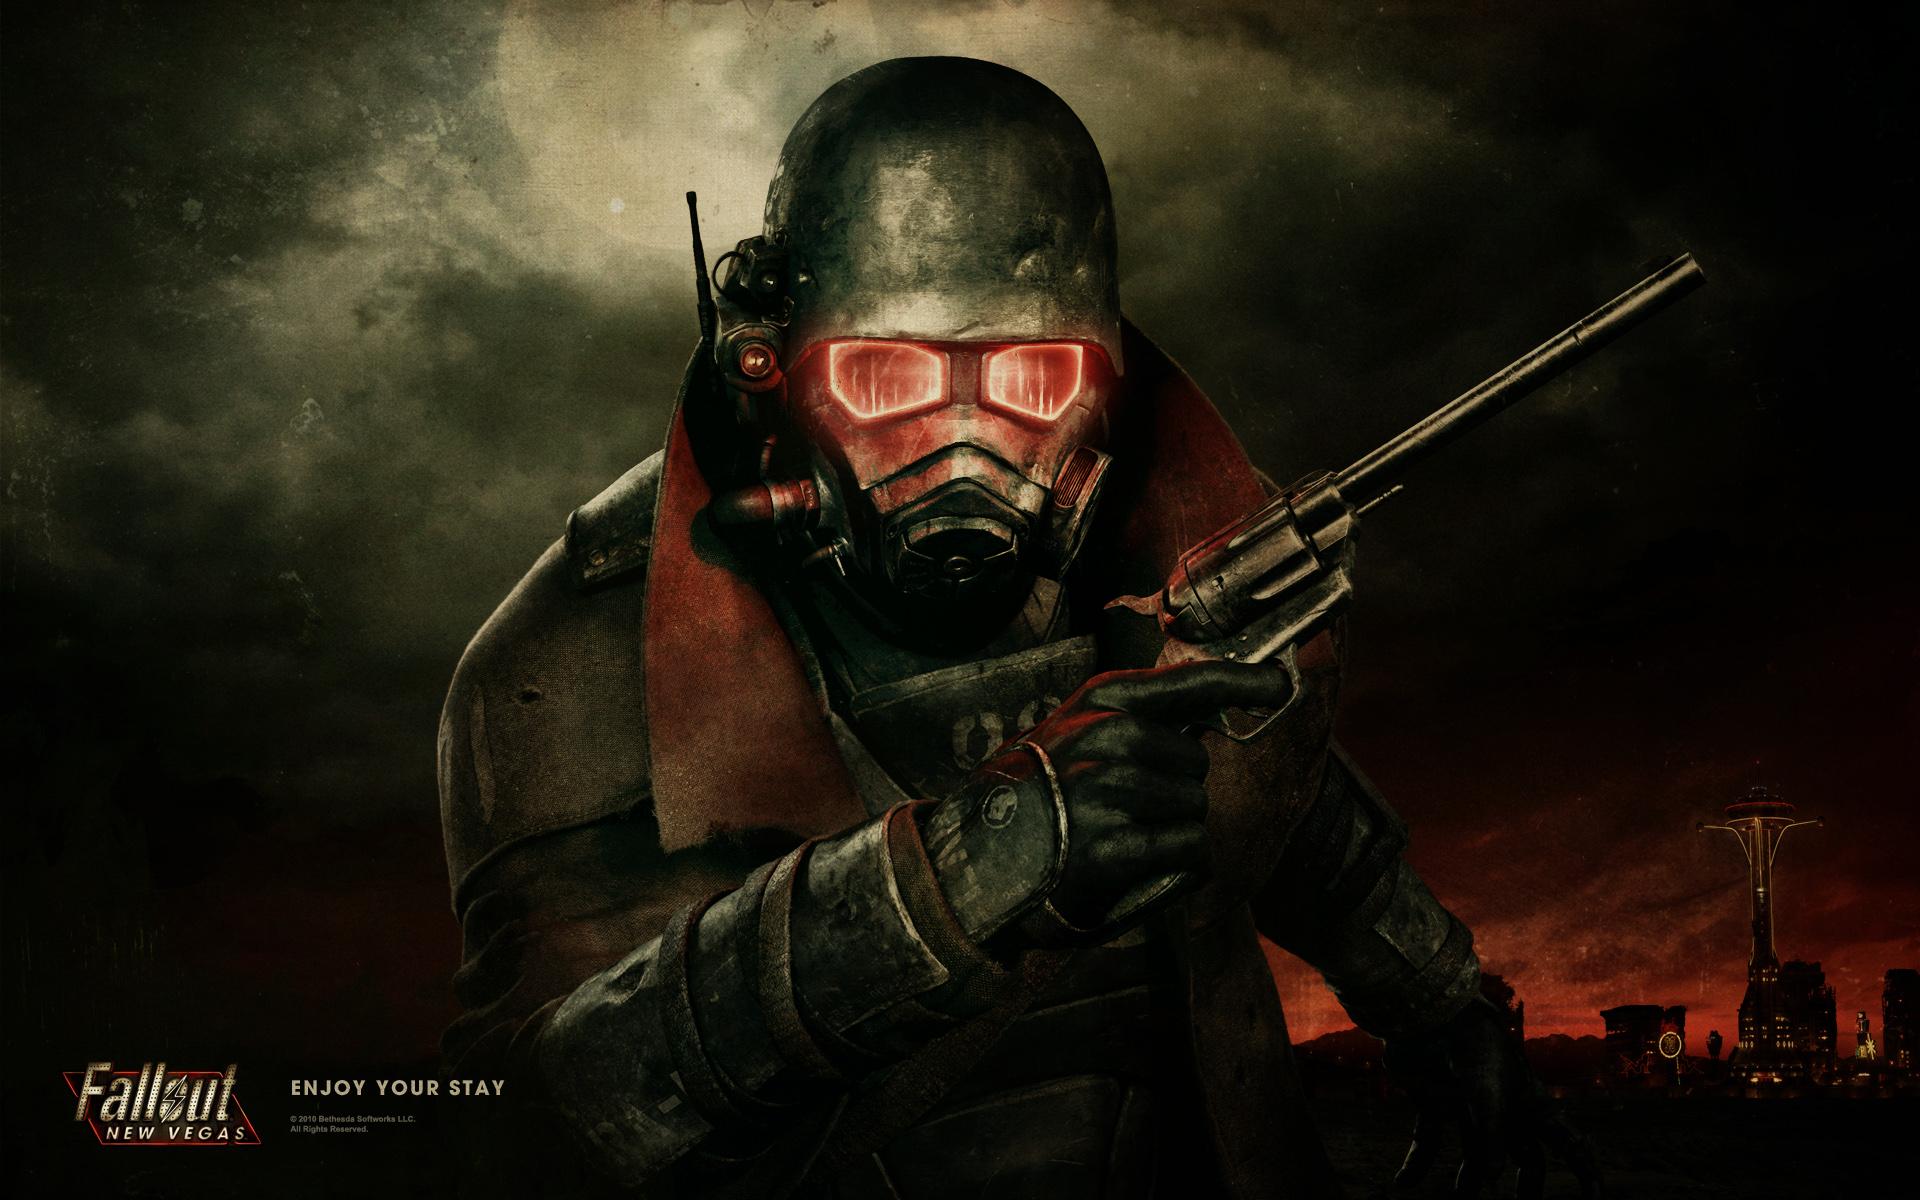 74 ] Fallout New Vegas Backgrounds on WallpaperSafari